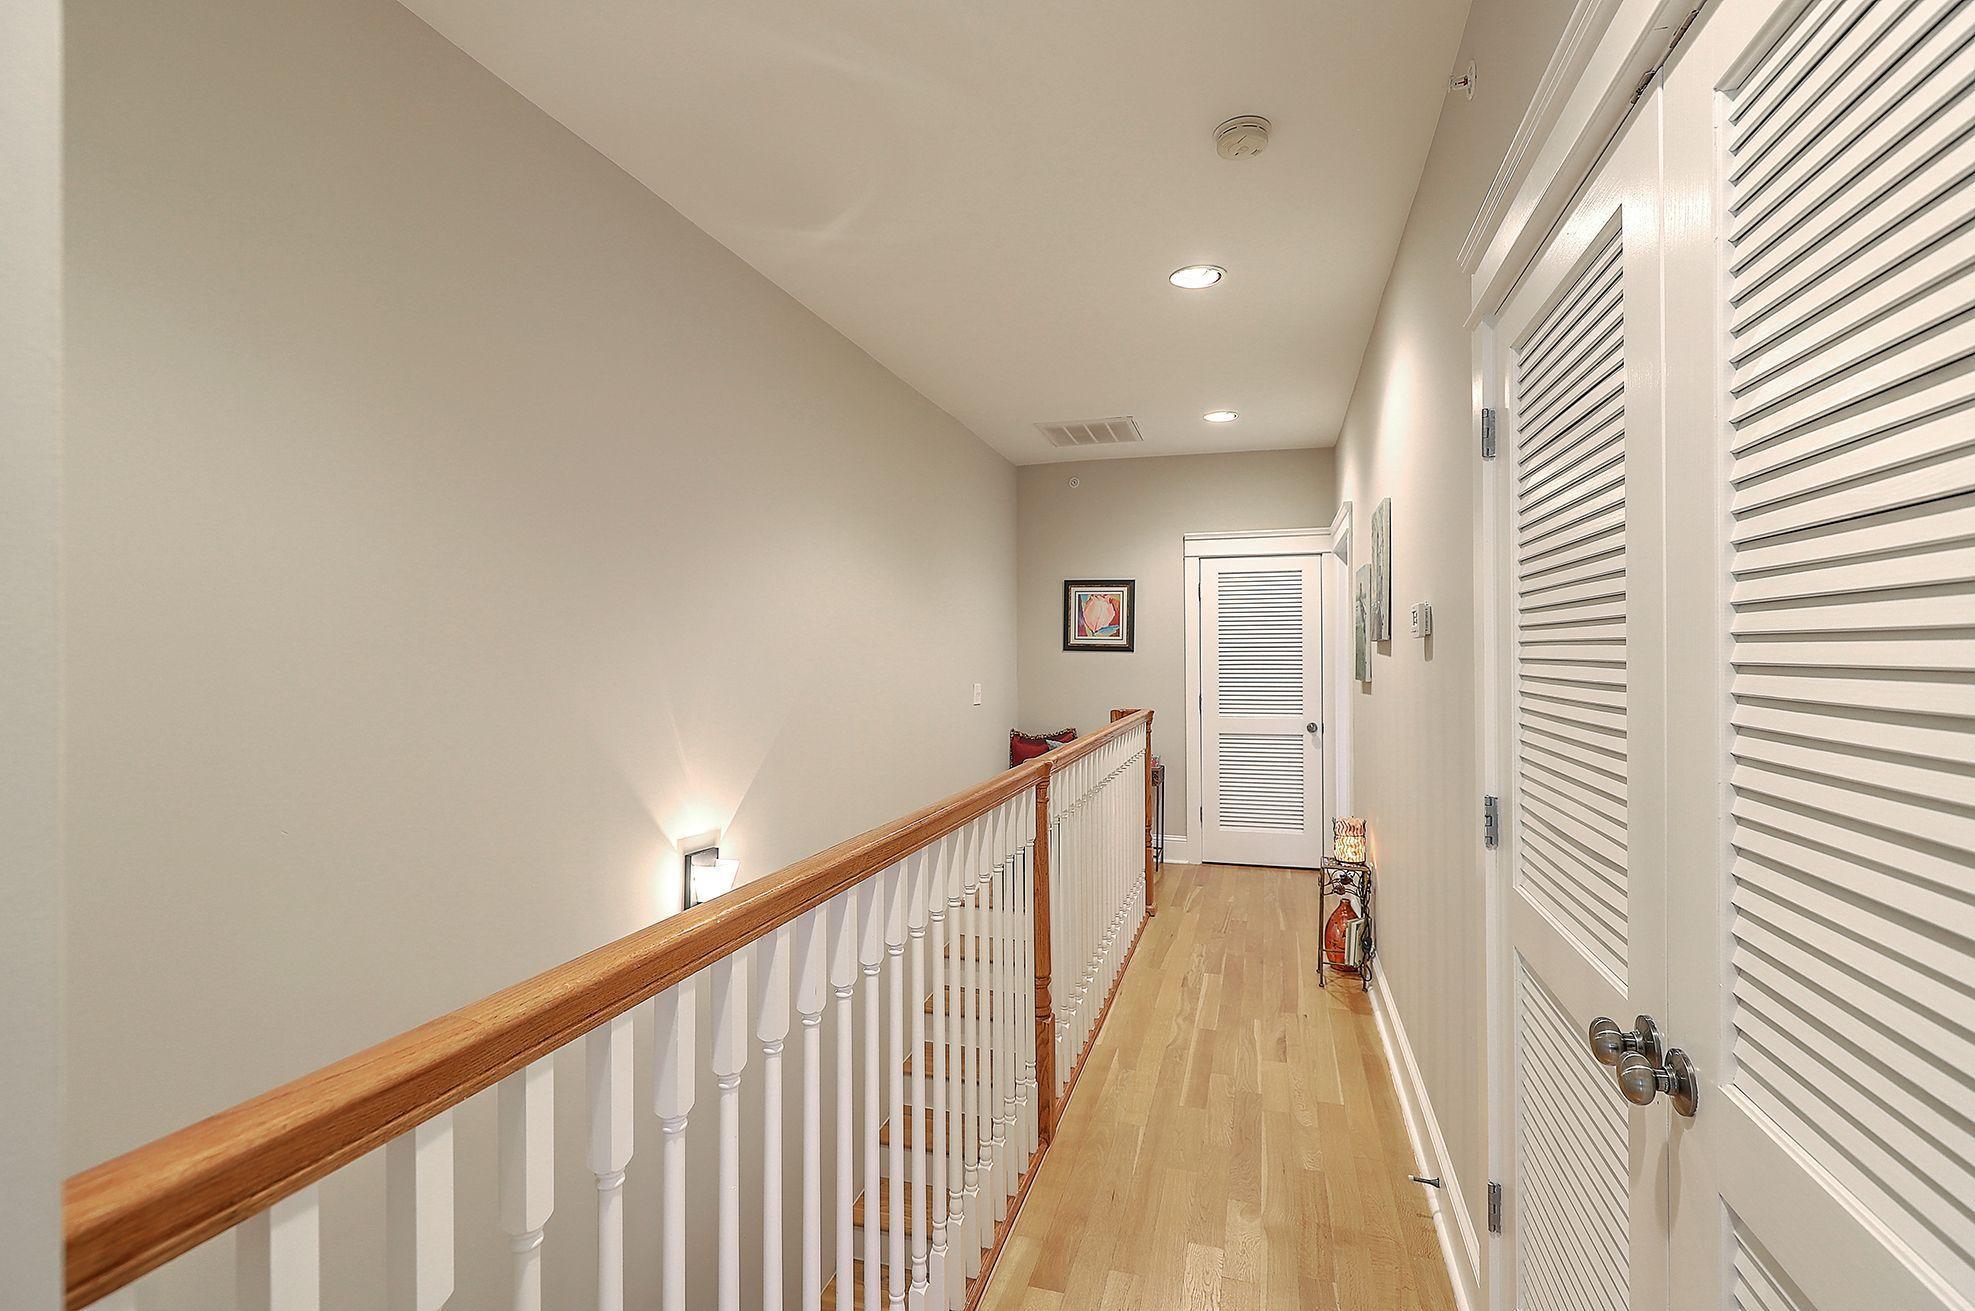 Etiwan Pointe Homes For Sale - 208 Etiwan Pointe, Mount Pleasant, SC - 24